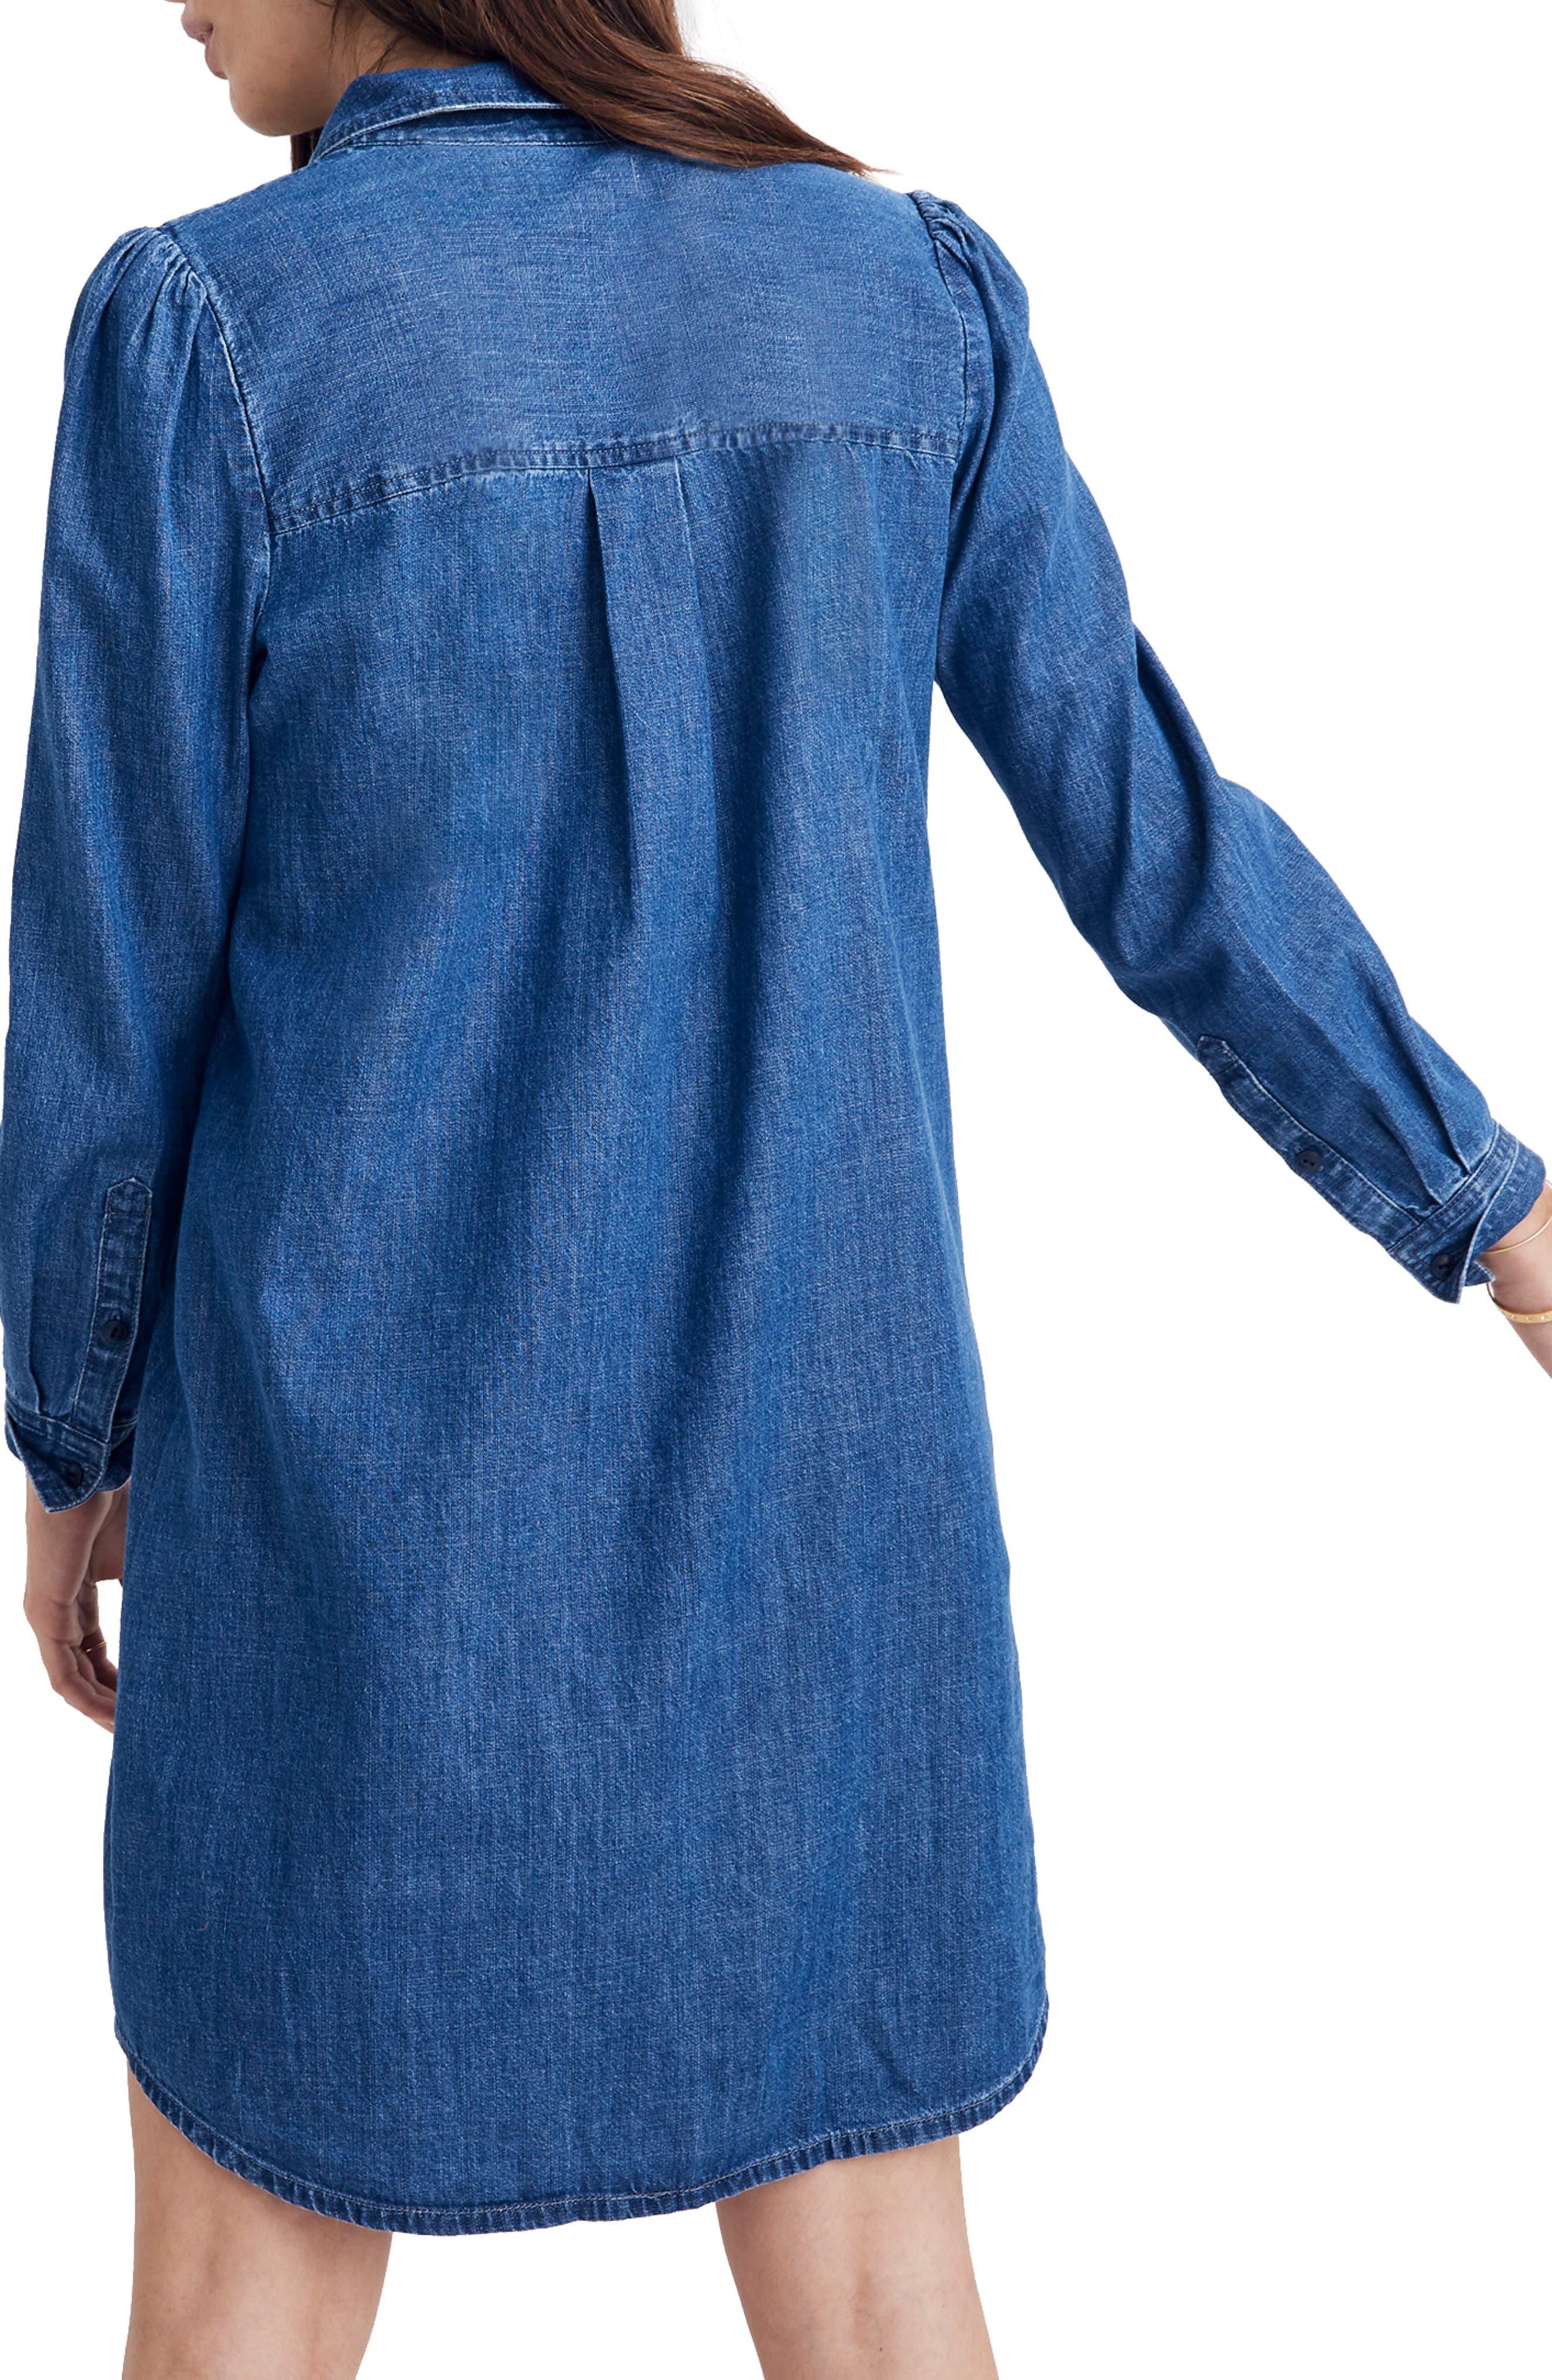 Puff Sleeve Denim Shirtdress,                             Alternate thumbnail 2, color,                             HARRIS WASH